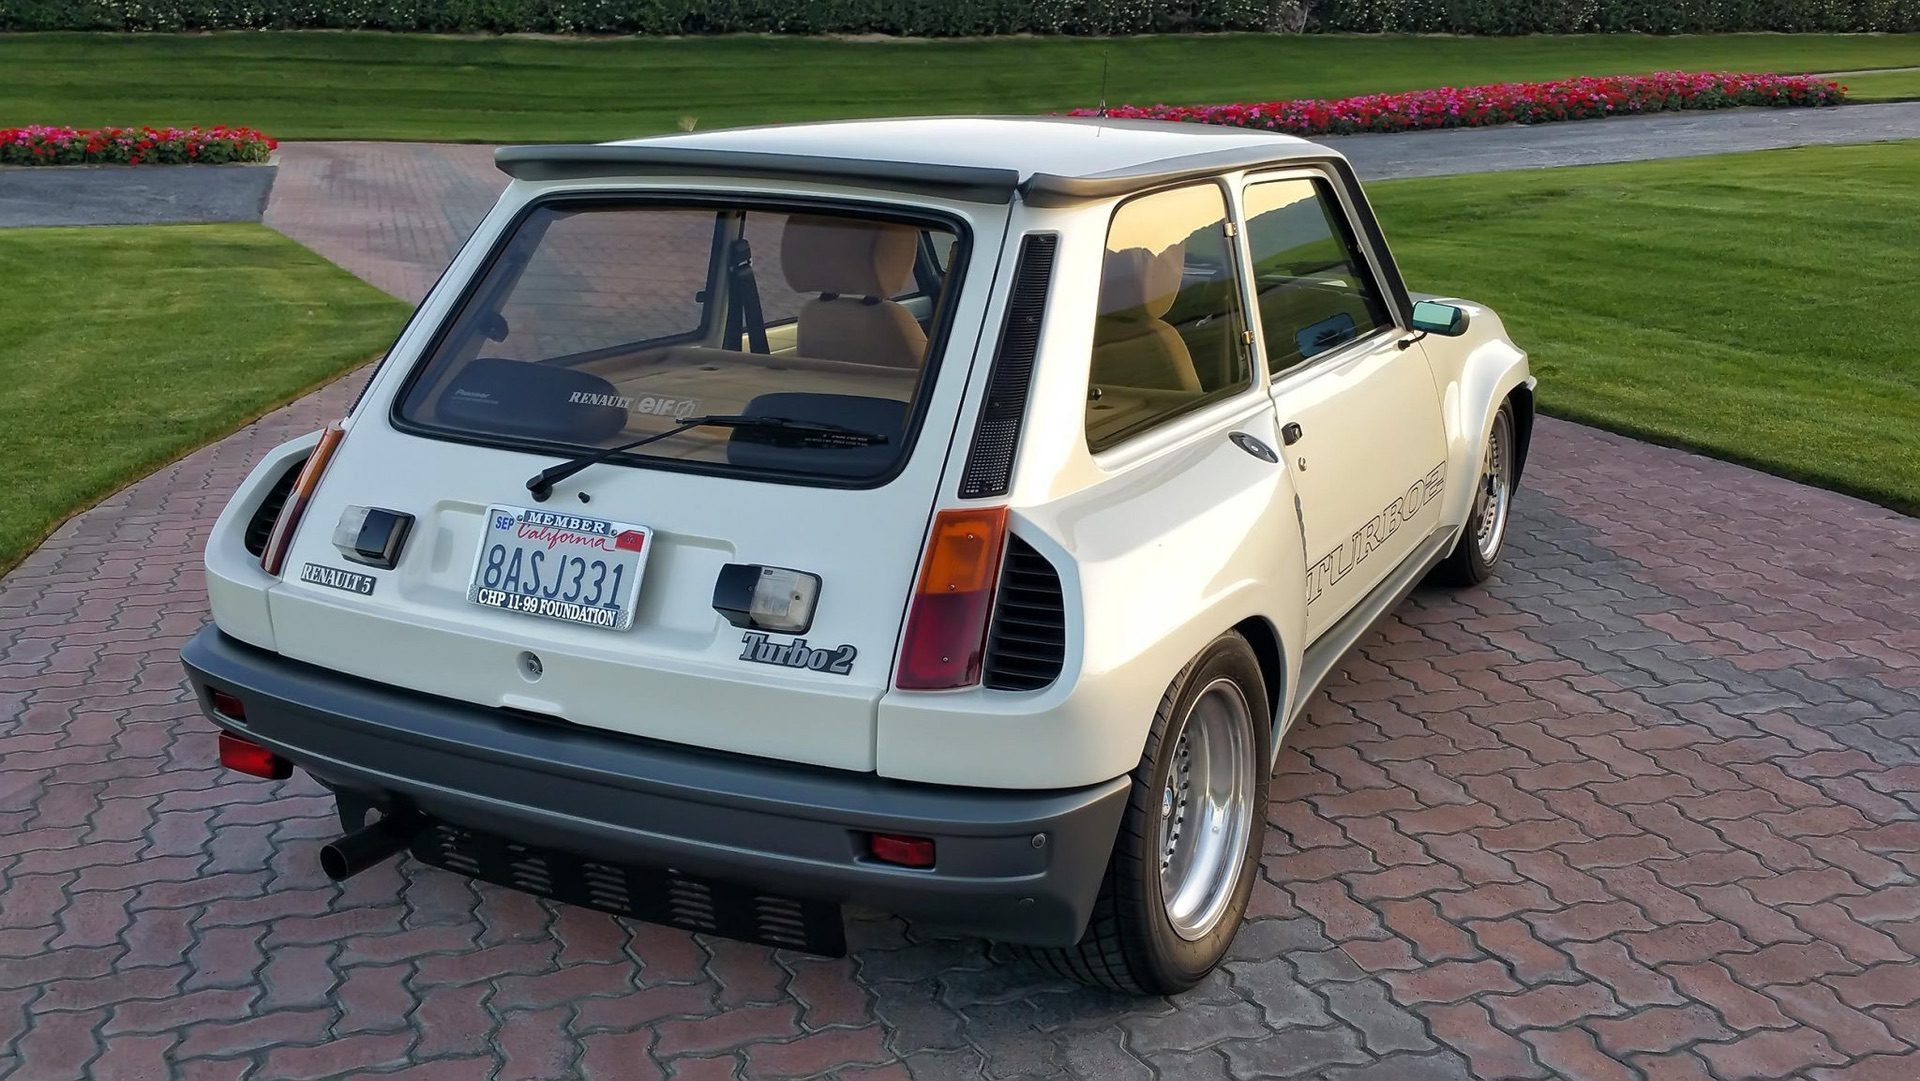 1985_Renault_R5_Turbo_2_rotary-0030